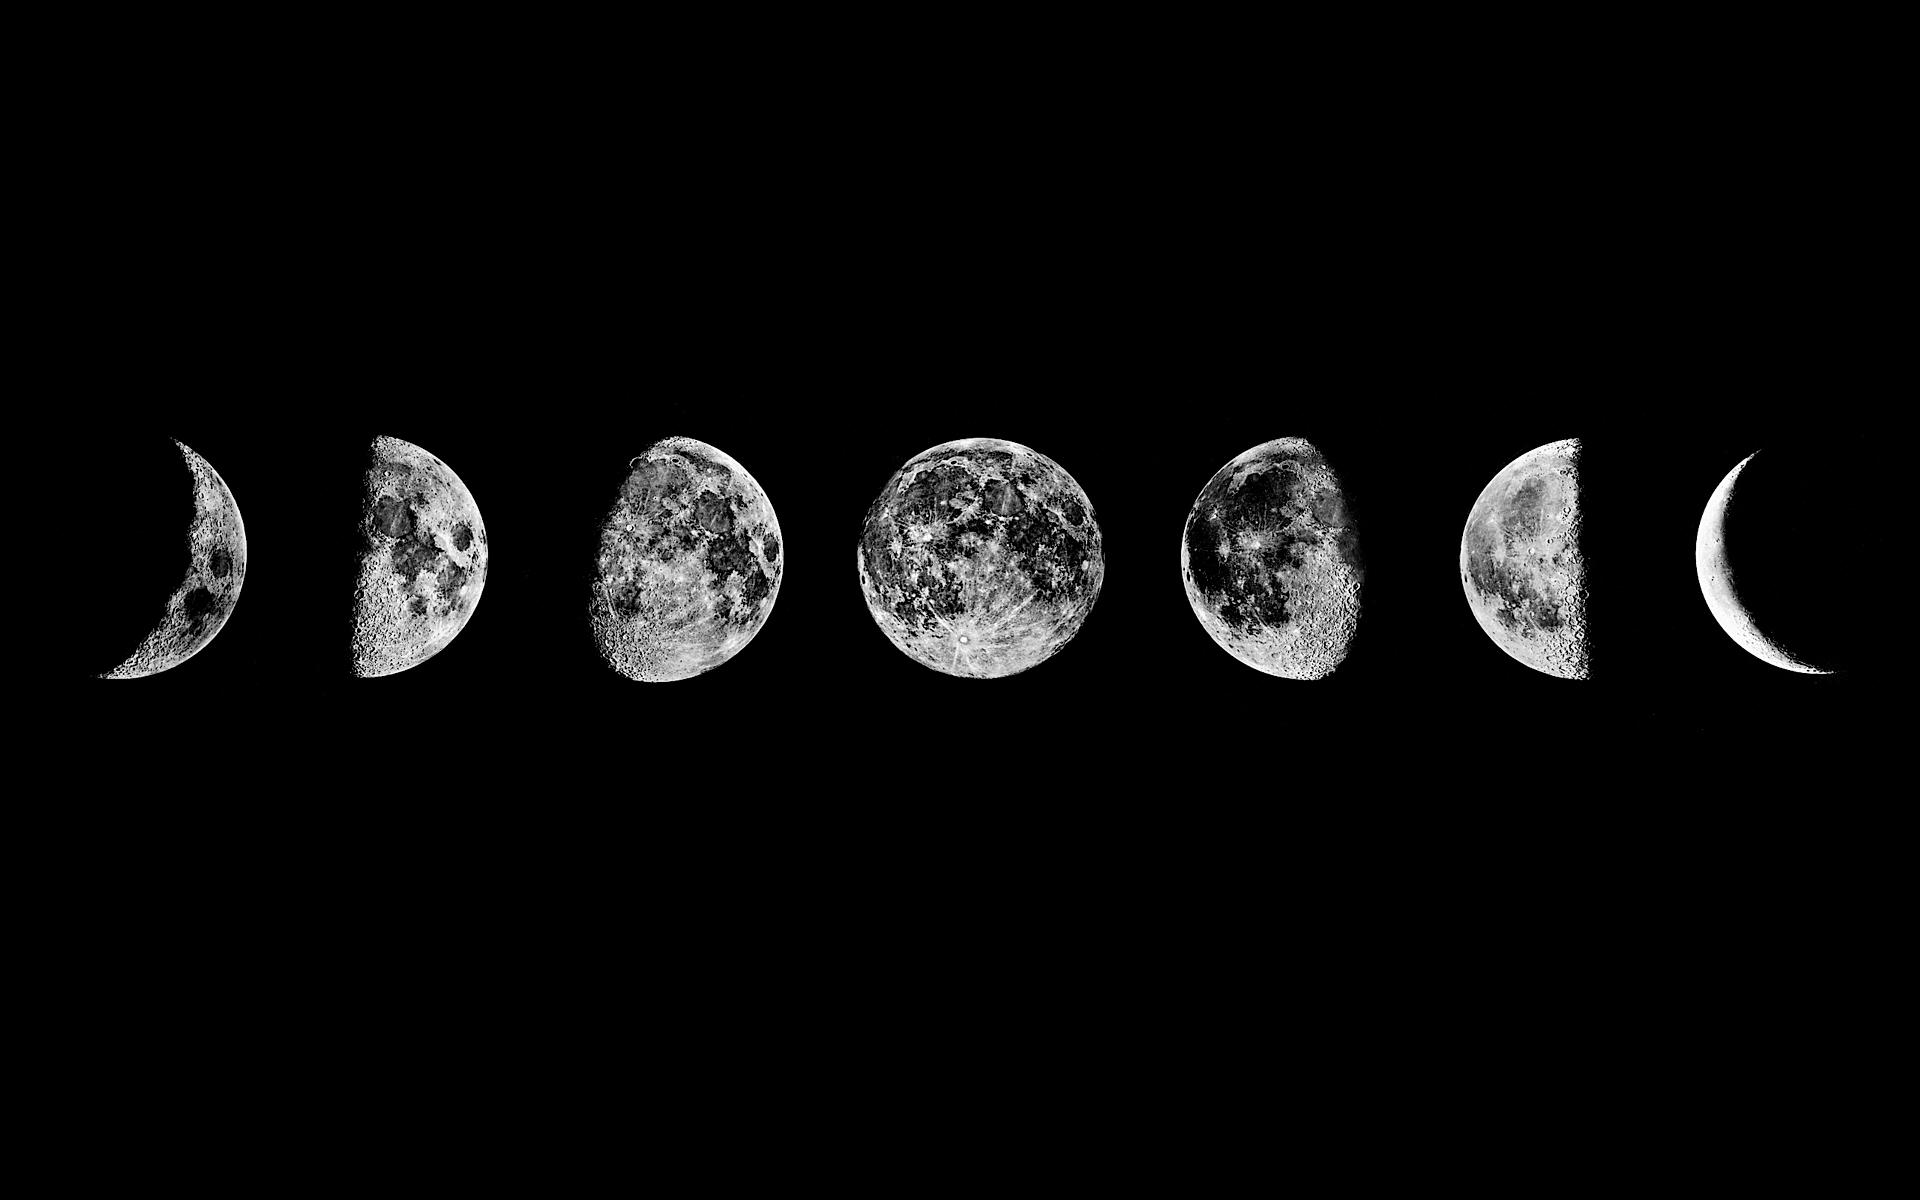 Cute Iphone Wallpaper Moon Phases Tumblr  Image 1879062 By Taraa On Favimcom